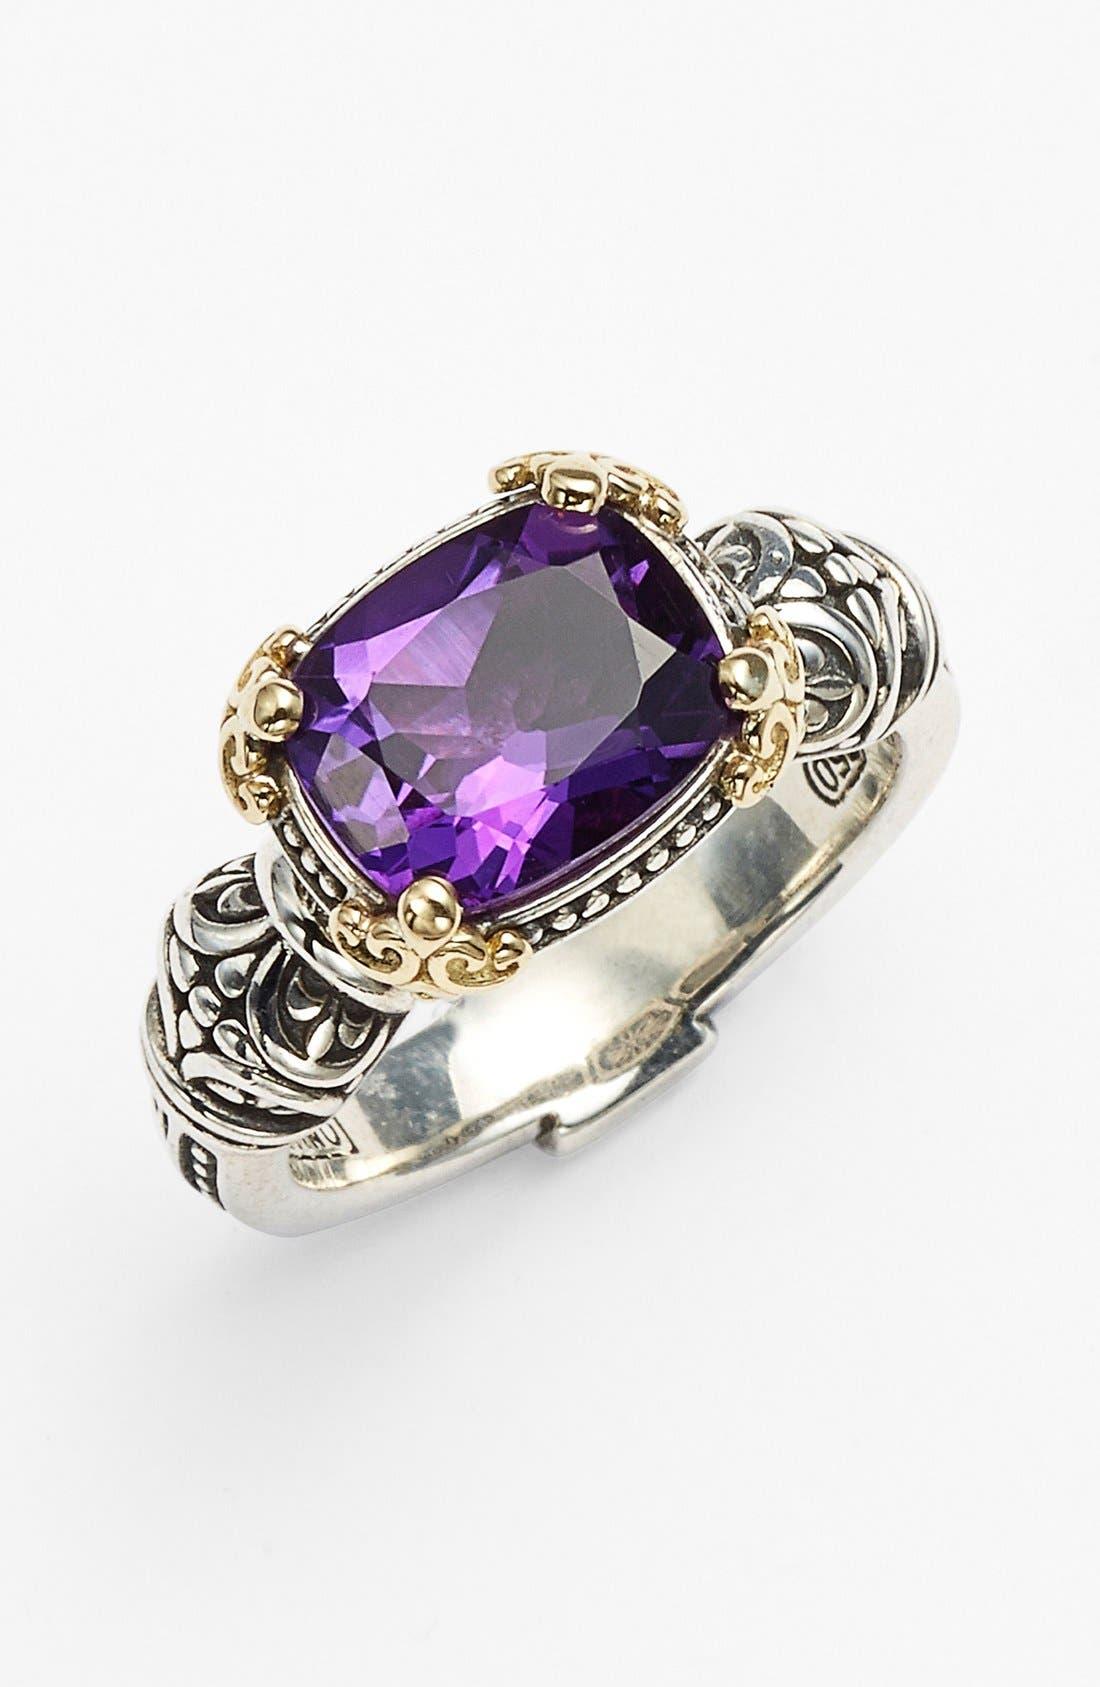 Main Image - Konstantino Hermione Stone Ring